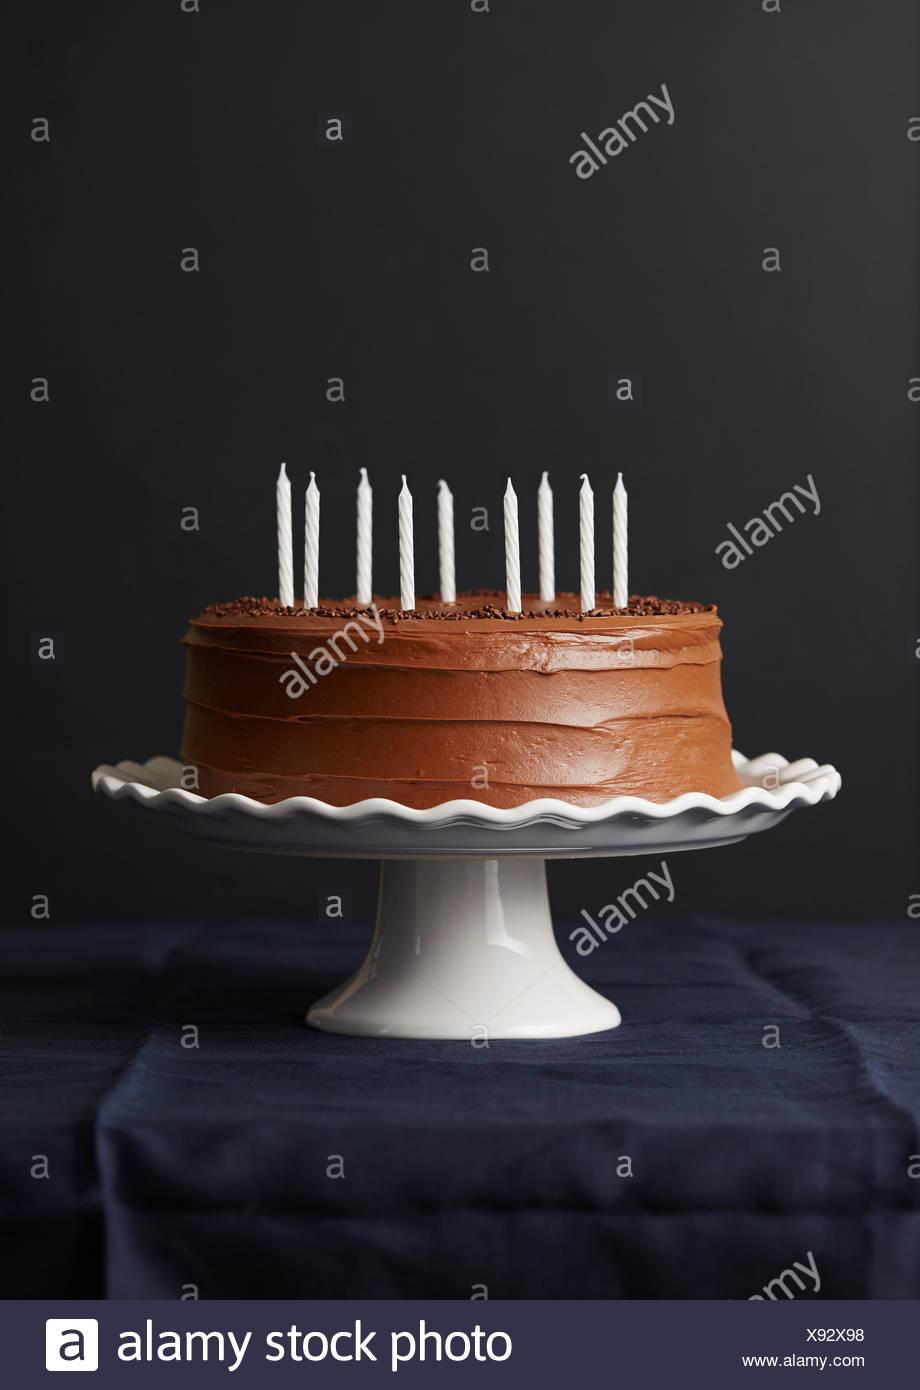 Pleasing Studio Shot Of Chocolate Birthday Cake Stock Photo 280962340 Alamy Birthday Cards Printable Trancafe Filternl